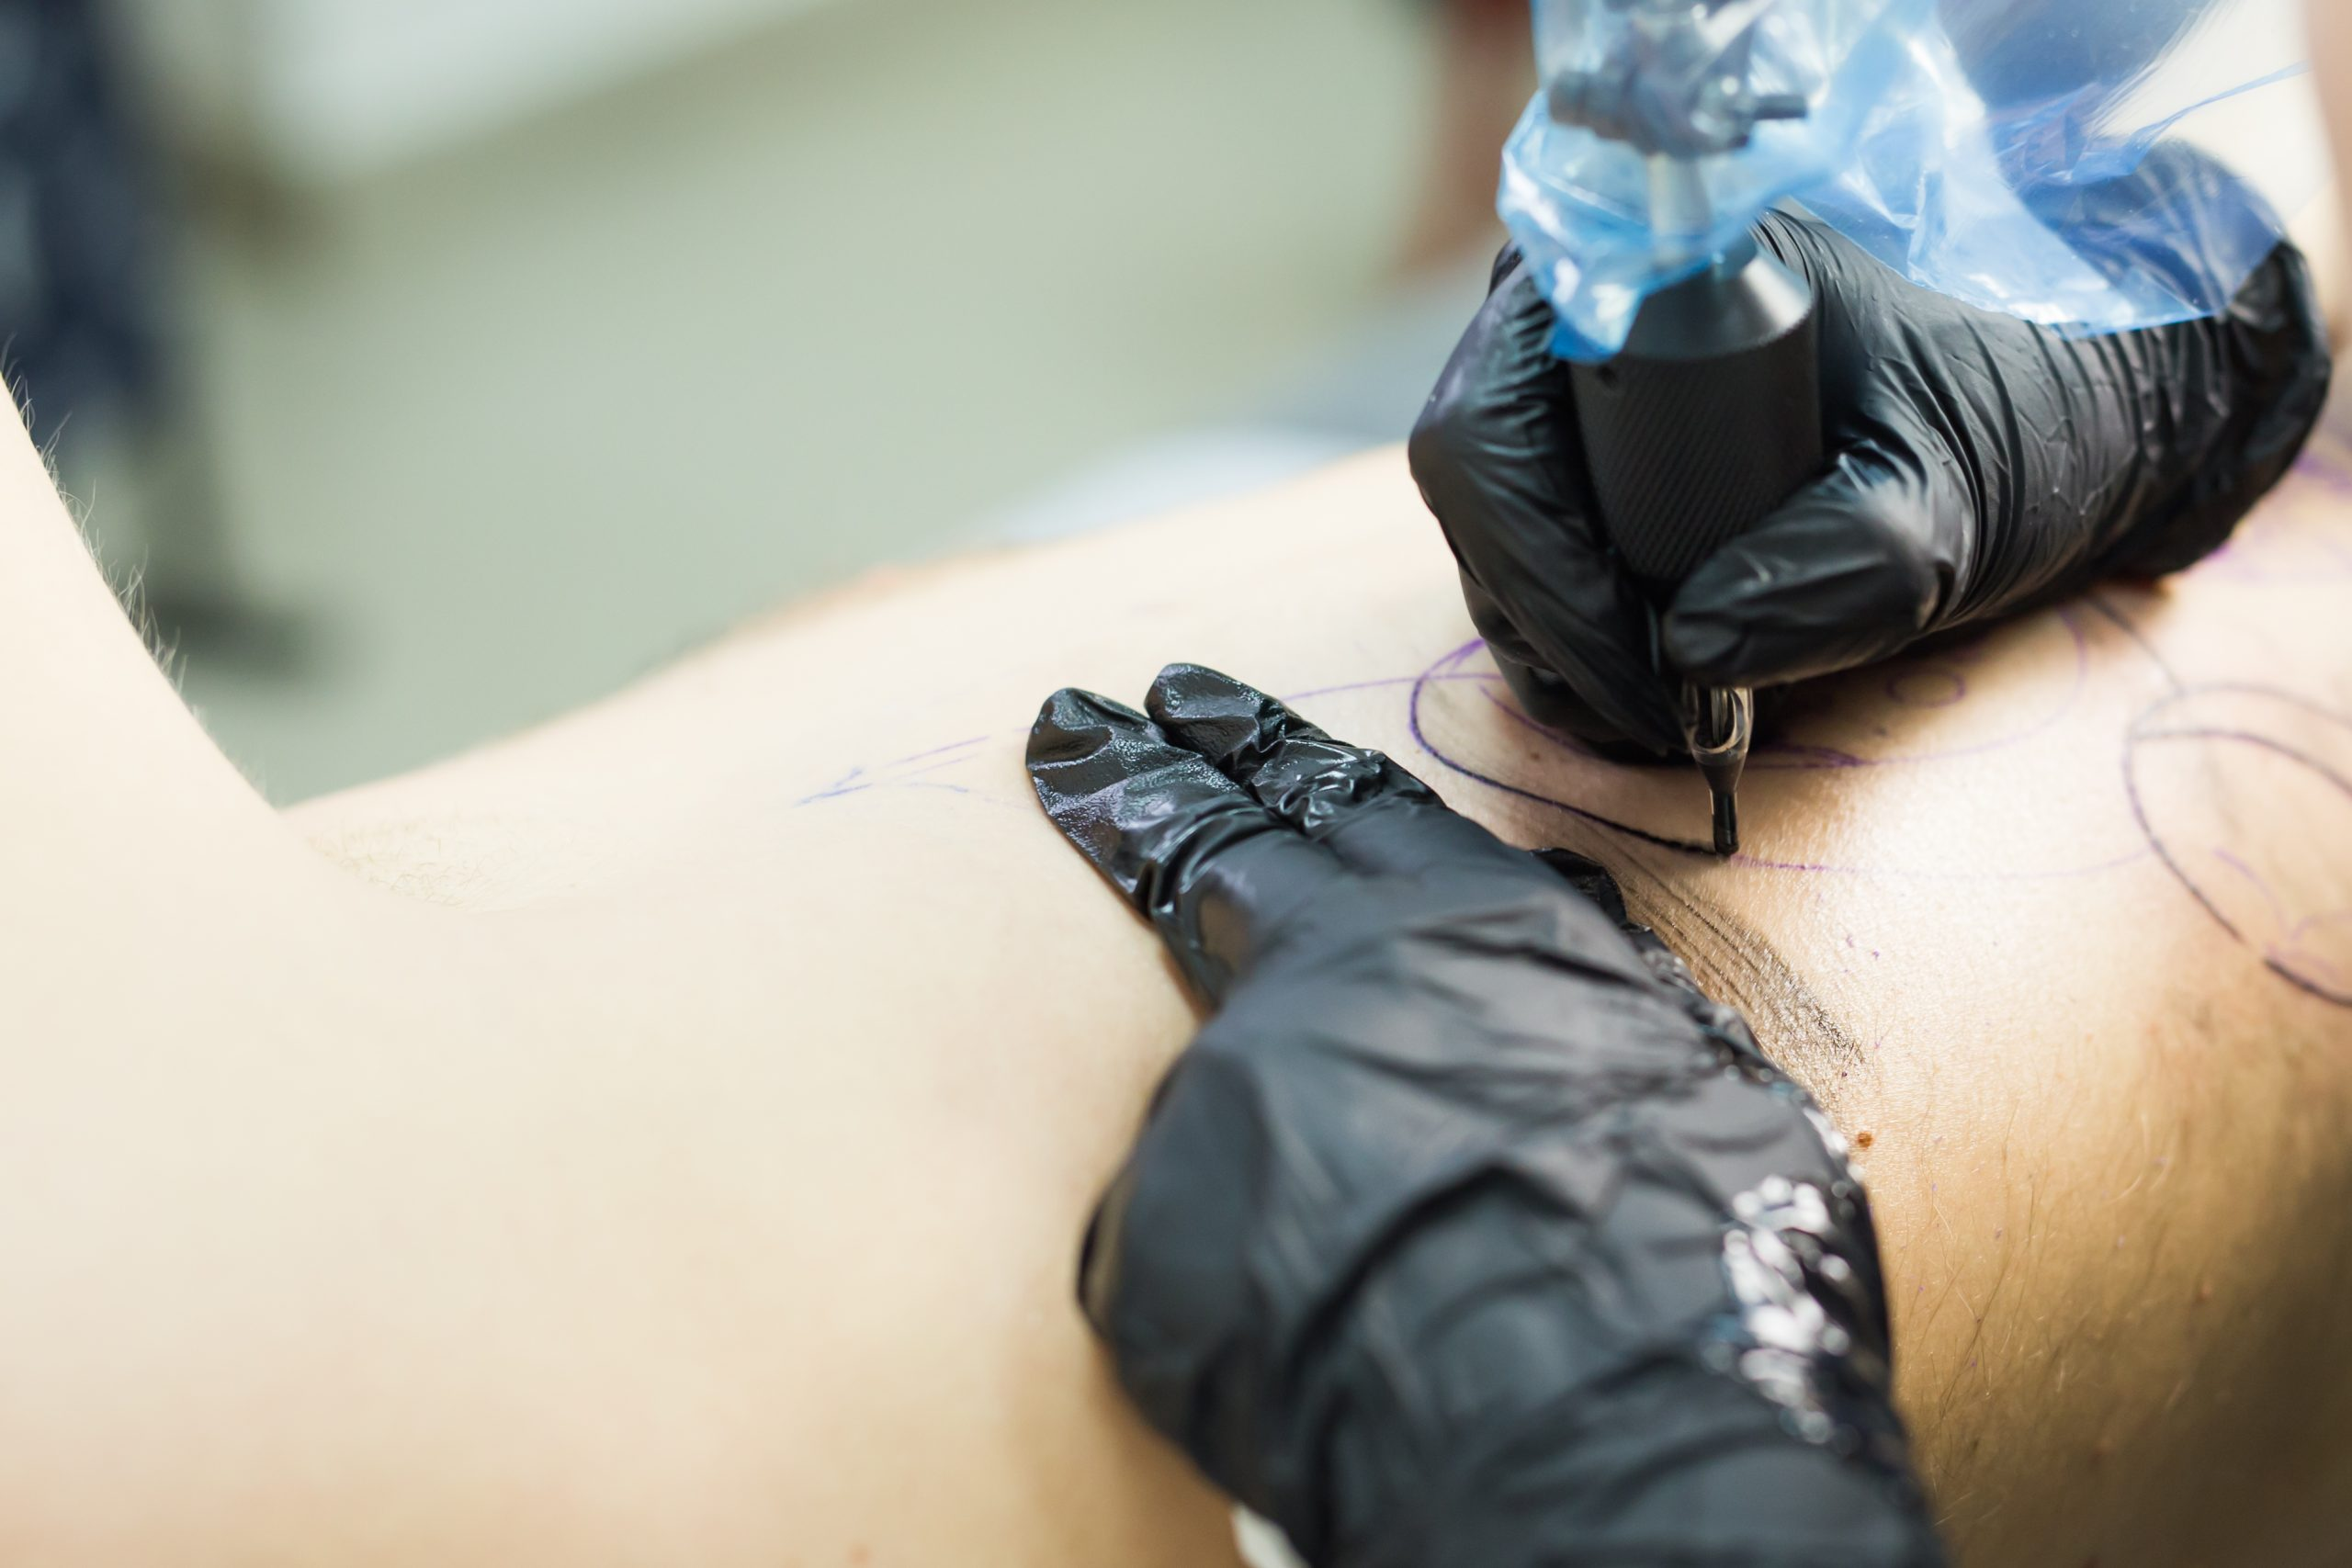 tattooer showing process of making a tattoo, hands holding a tatoo machine